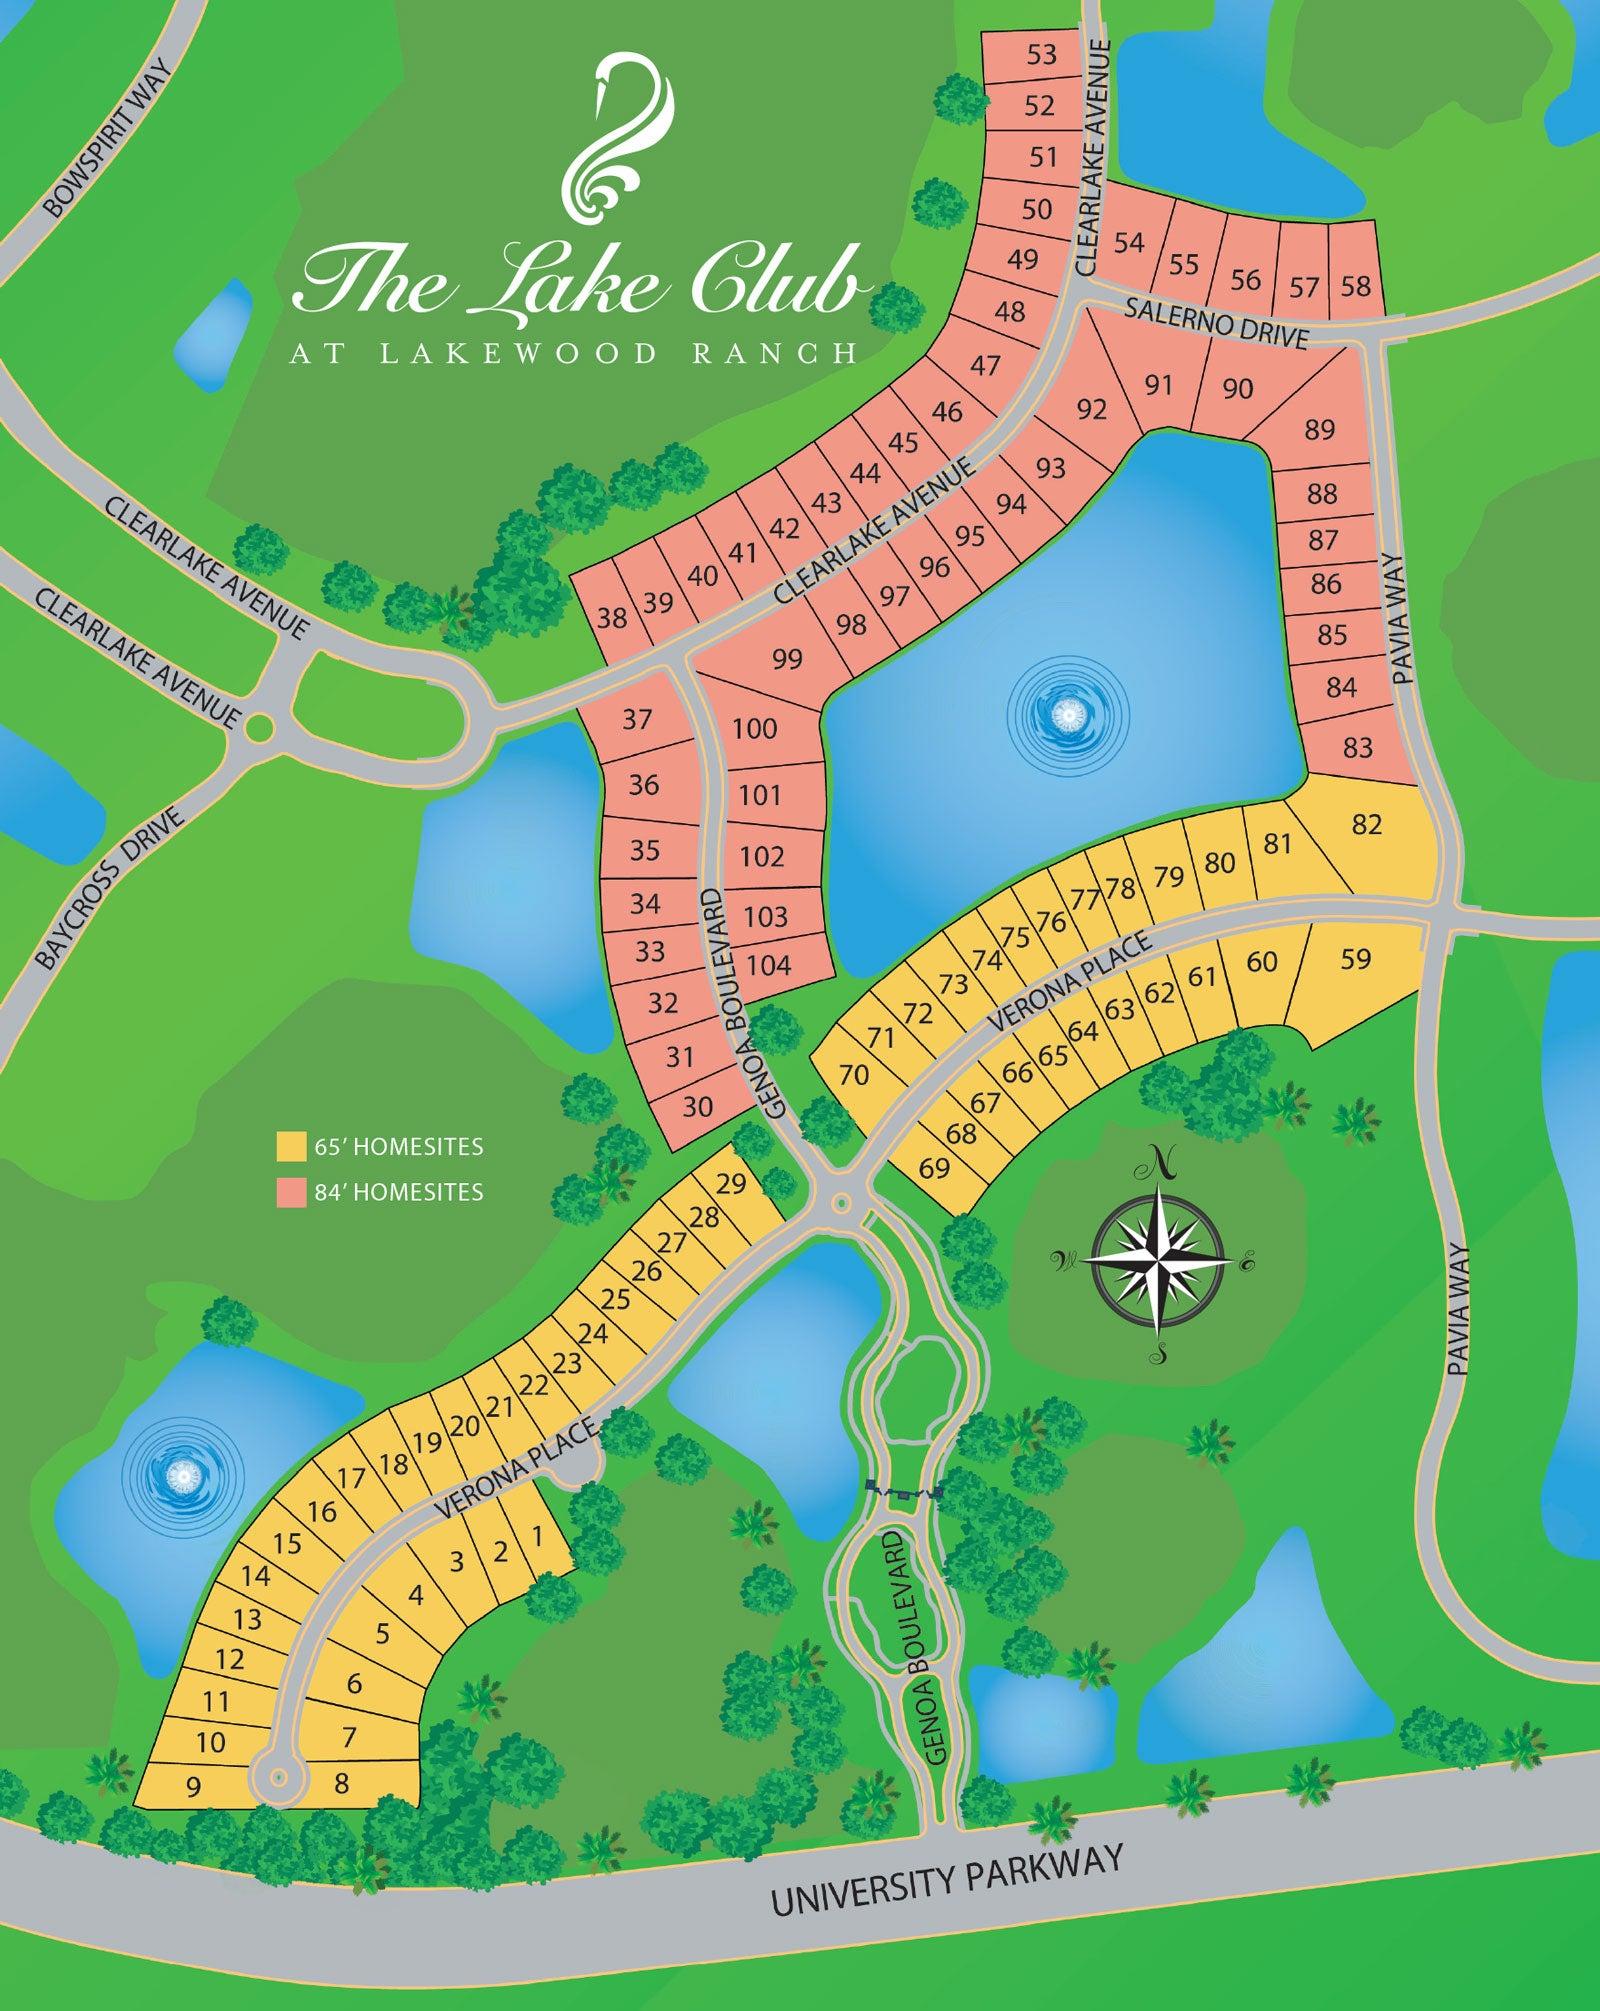 Genoa at The Lake Club / Site Plan